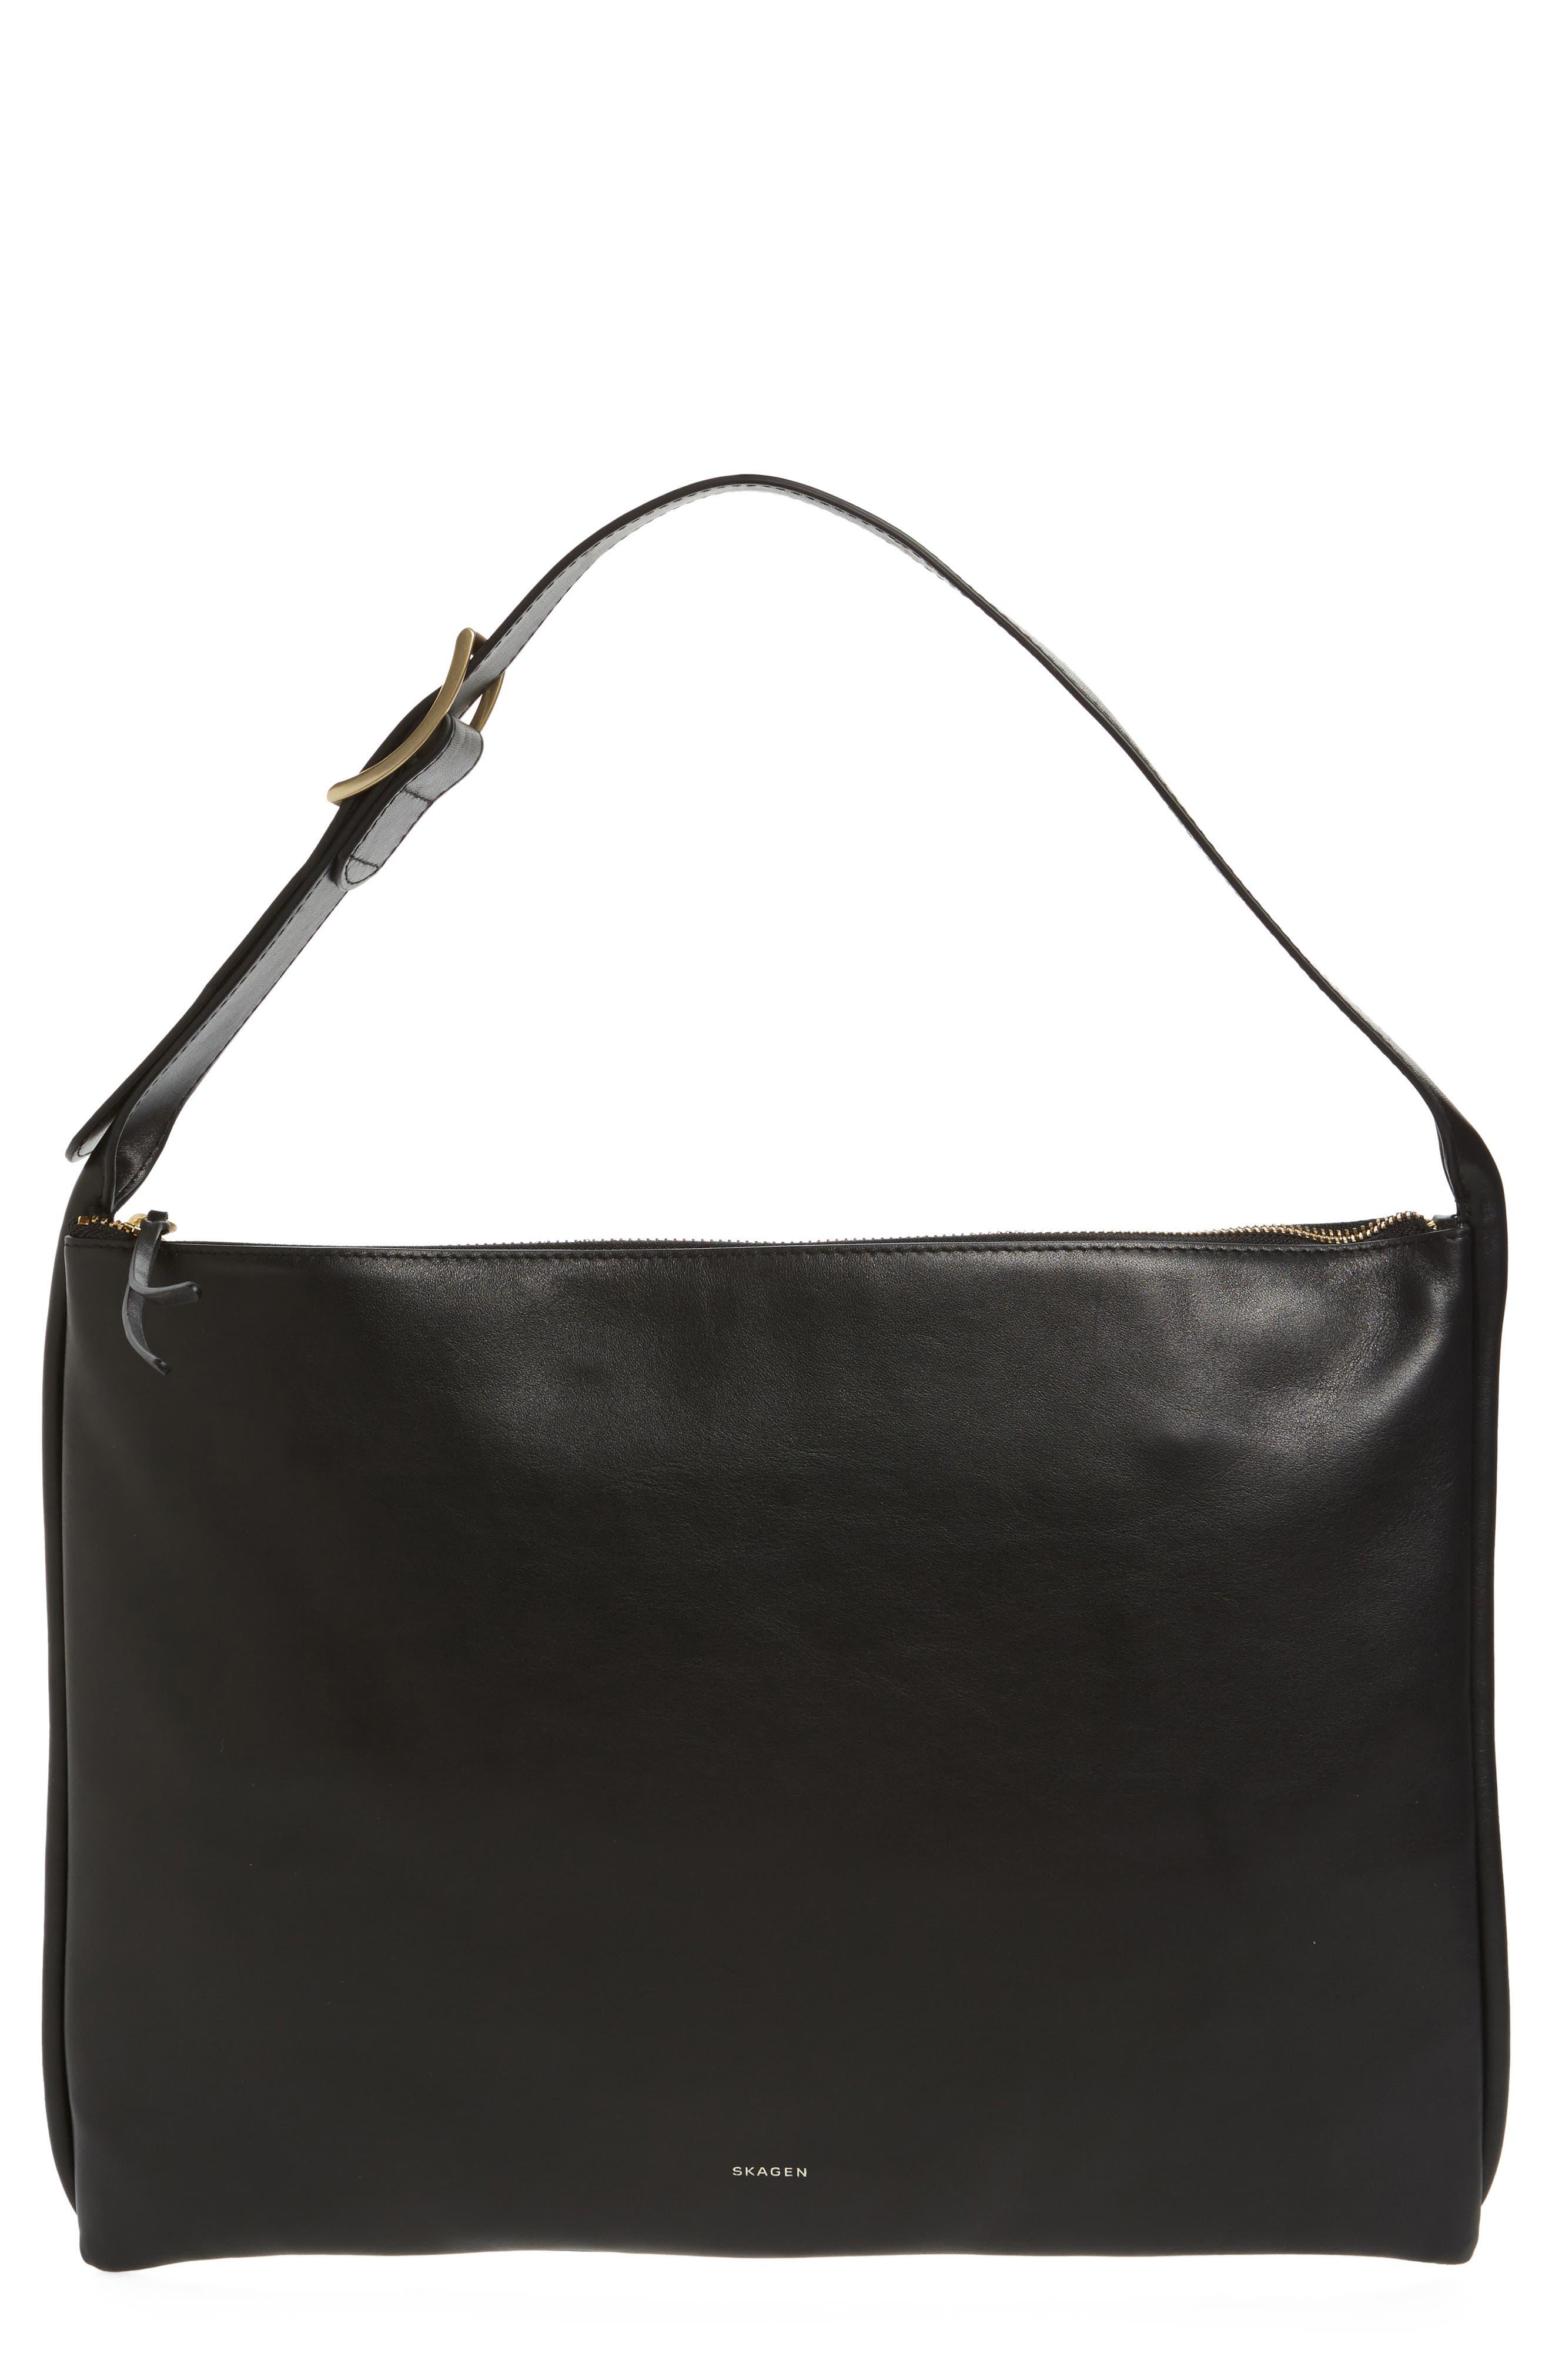 Anesa Leather Shoulder Bag,                             Main thumbnail 1, color,                             Black